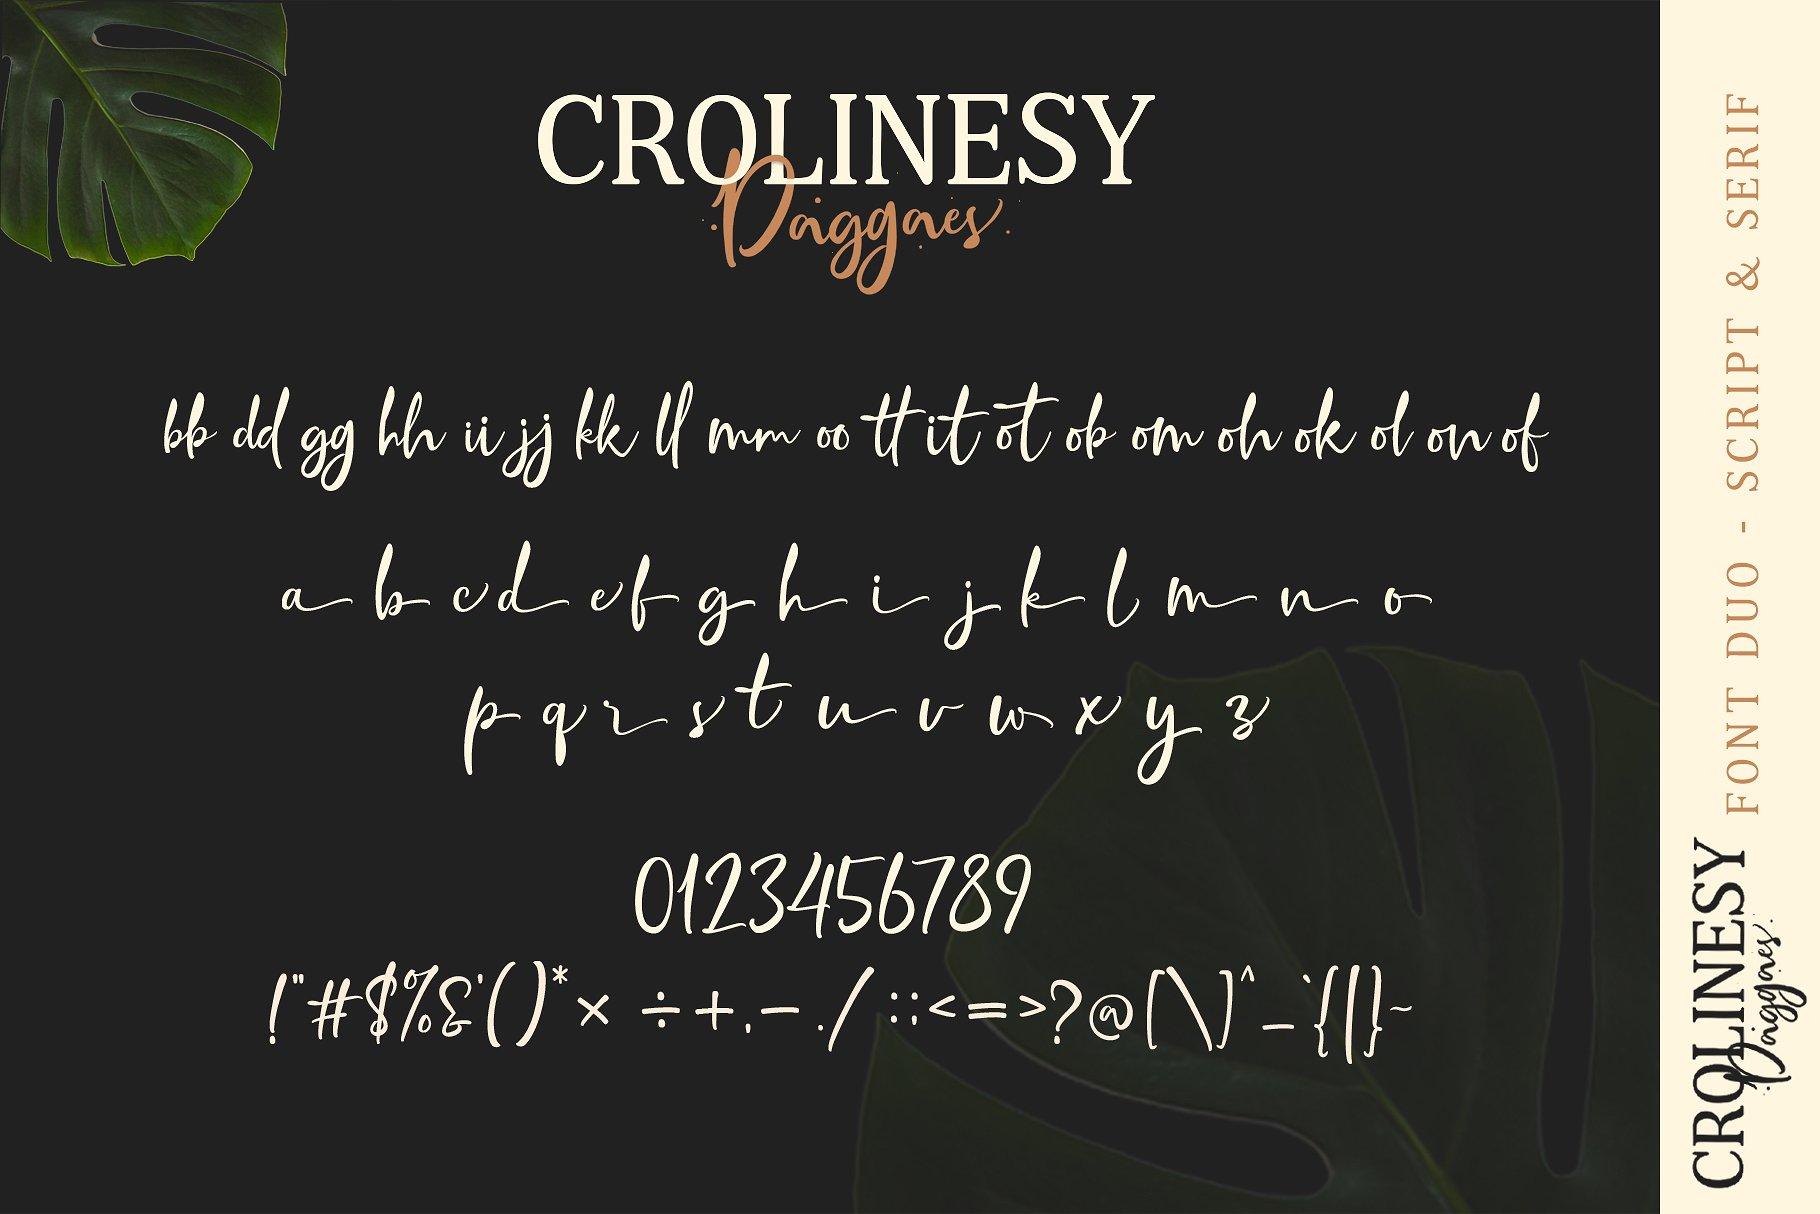 Crolinesy Daggaes Font Duo 7 - دانلود فونت Crolinesy Daggaes - مجموعه 6 فونت و فونت اسکریپت پرمیوم